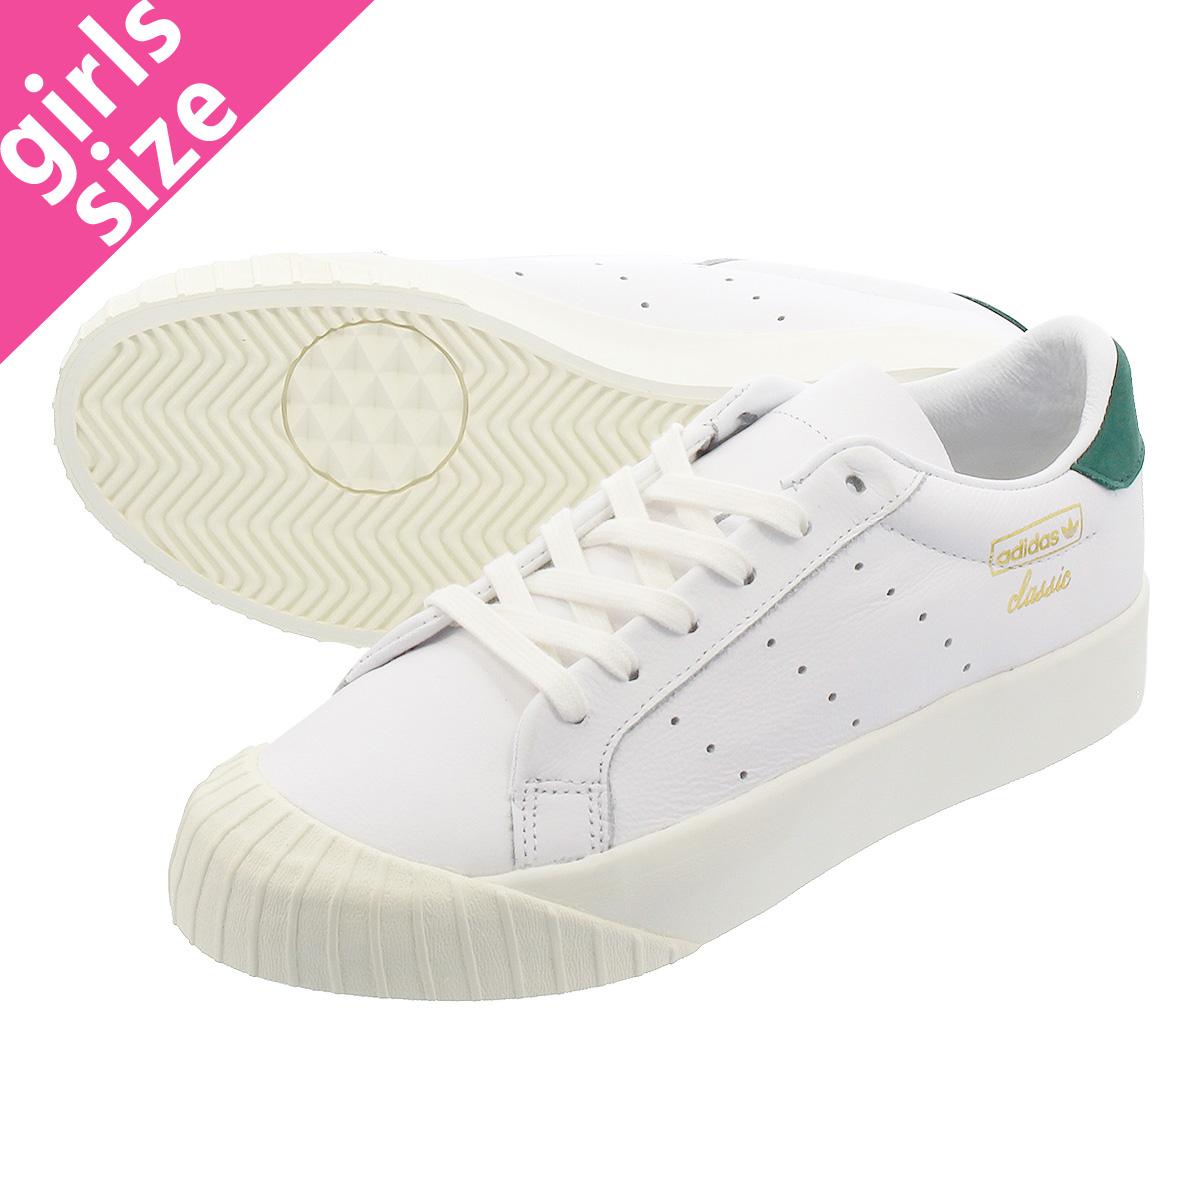 e78658979bd0d8 adidas EVERYN W Adidas Ebb phosphorus women RUNNING WHITE RUNNING WHITE COLLEGIATE  GREEN cg6076